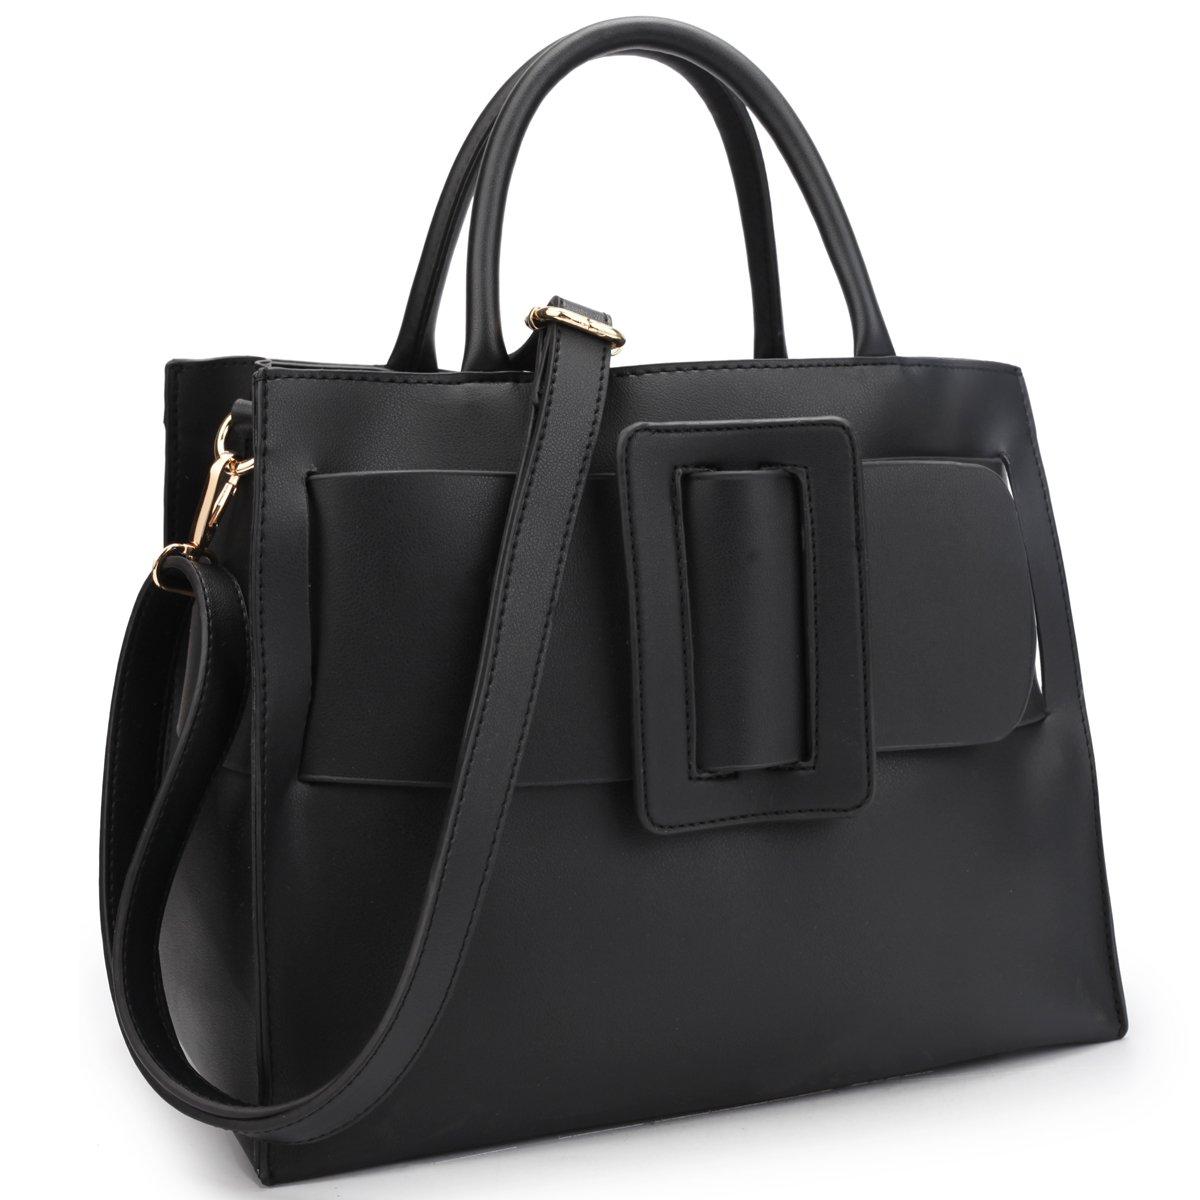 Women Vegan Leather Handbags Fashion Satchel Bags Shoulder Purses Top Handle Work Bags